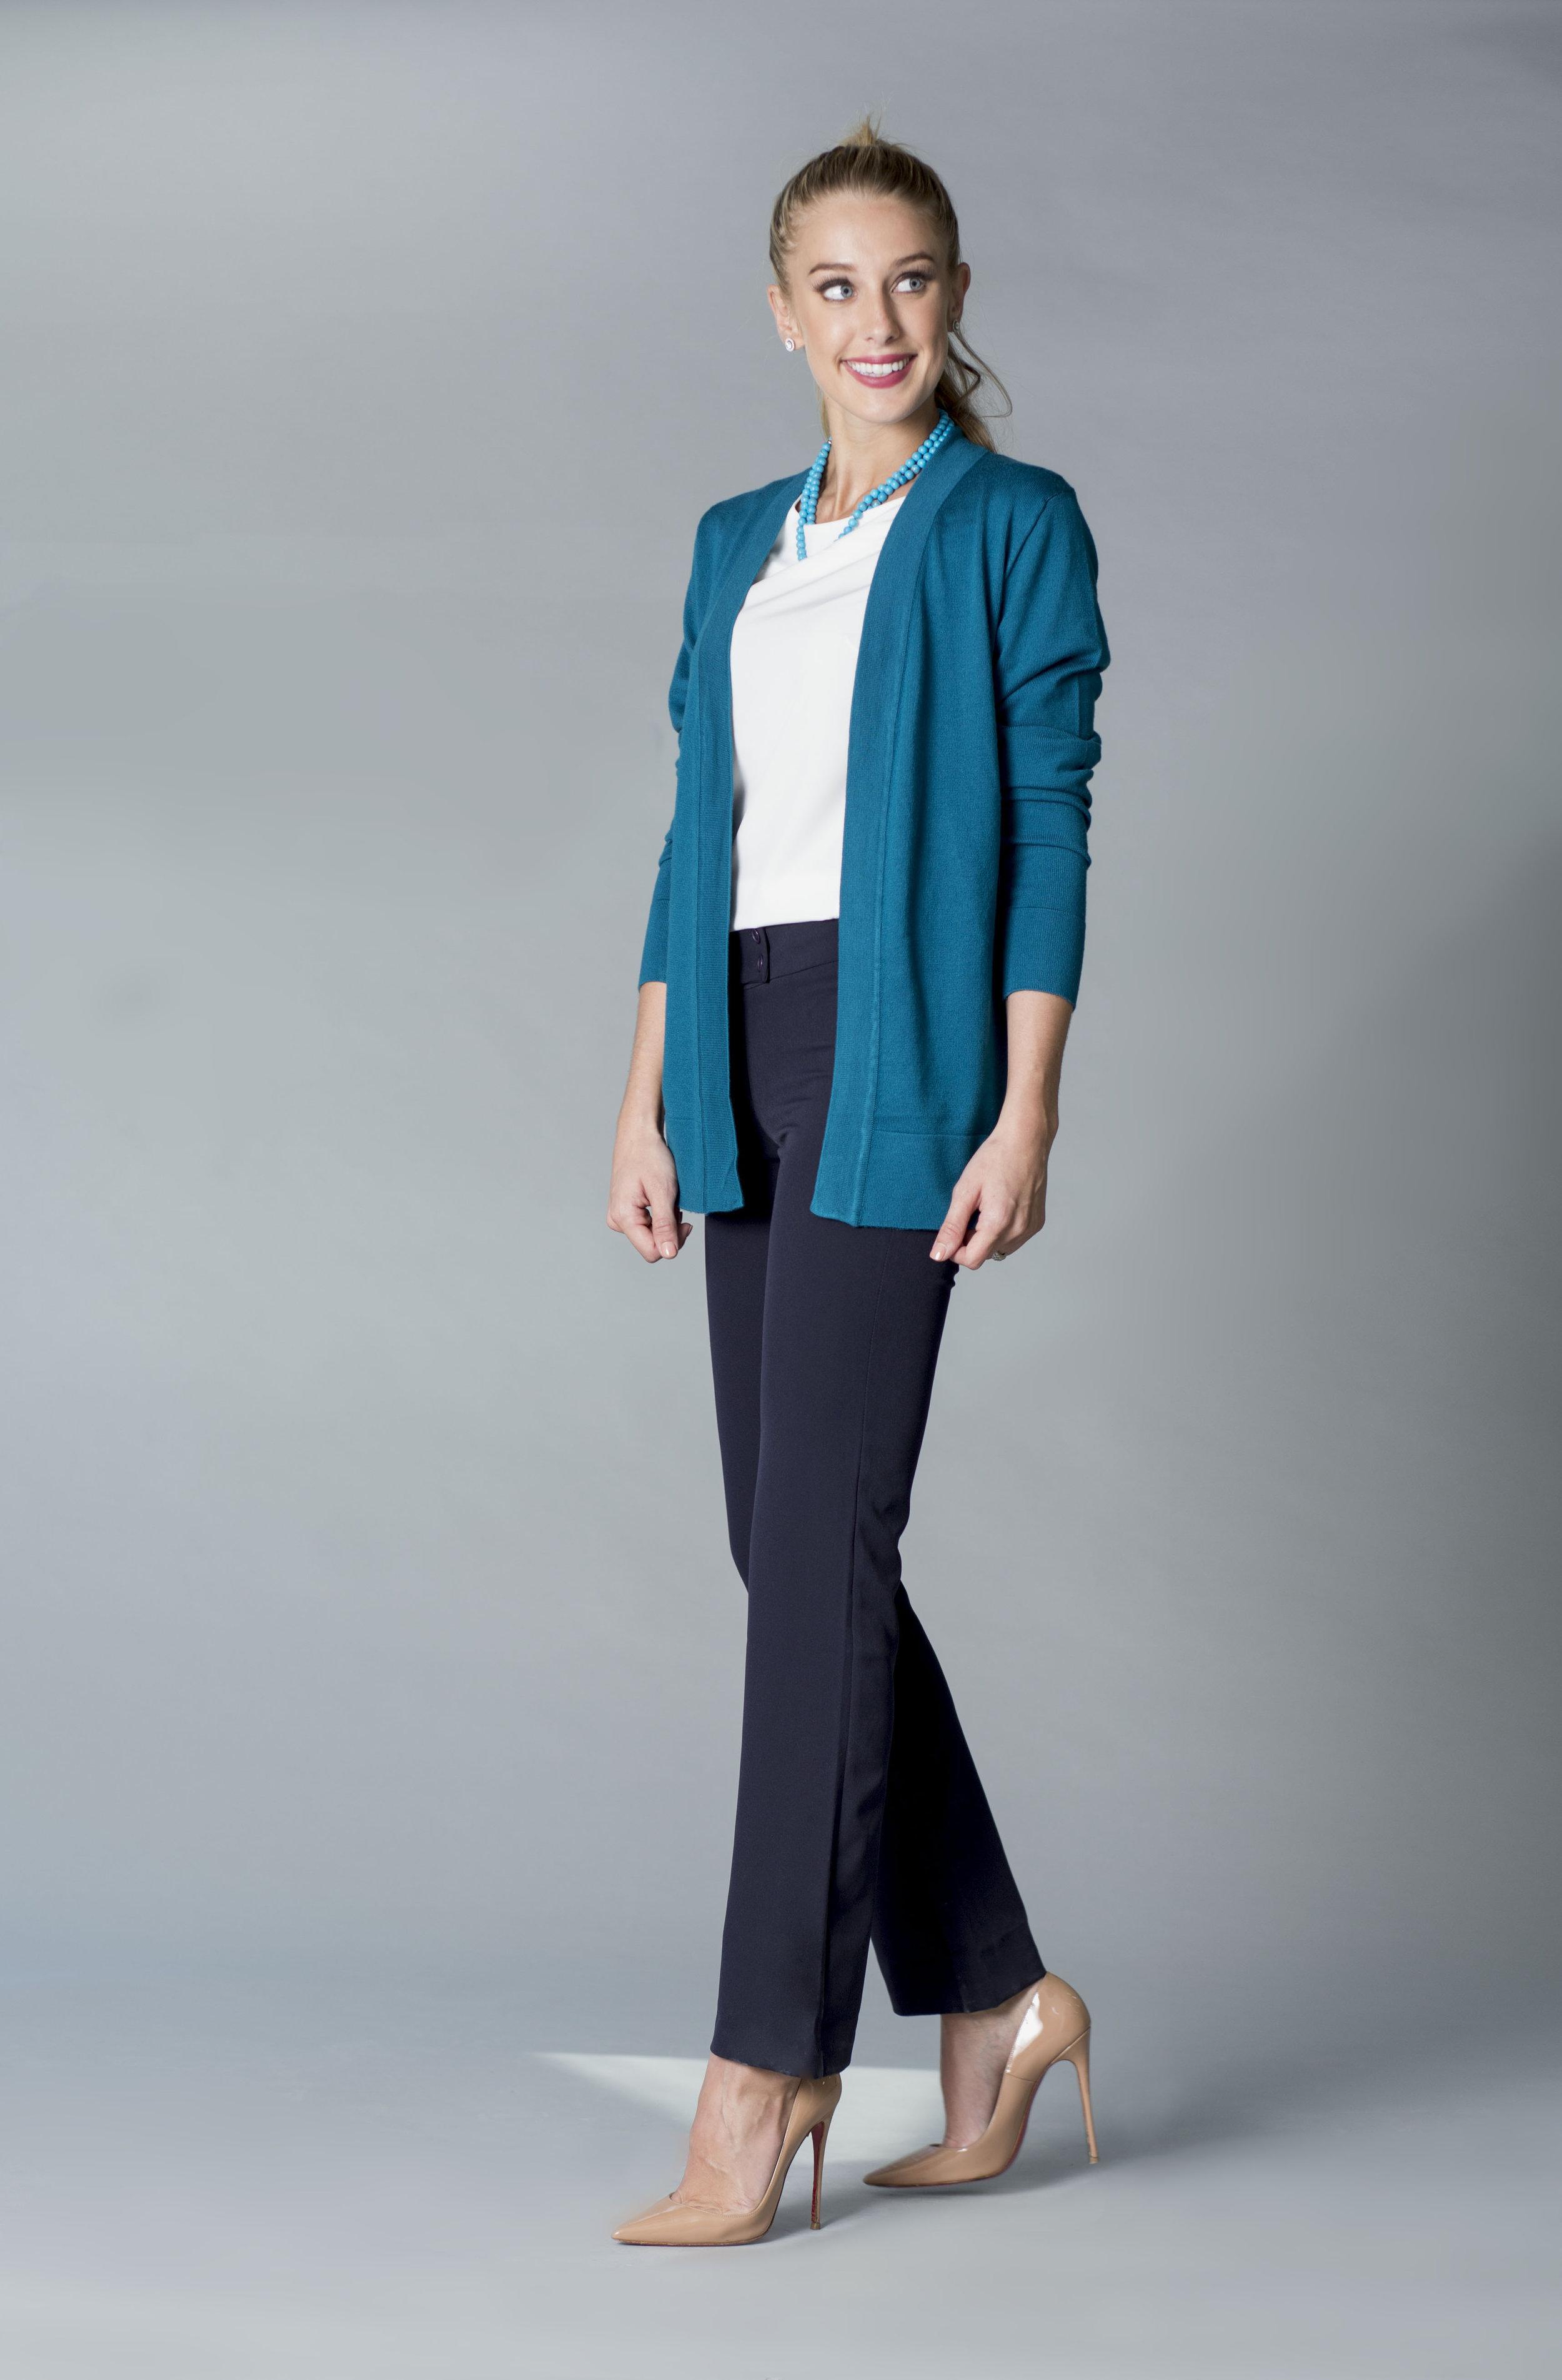 MDSN 624 624 blanca -pant azul-cardigan azul pet copy.jpg